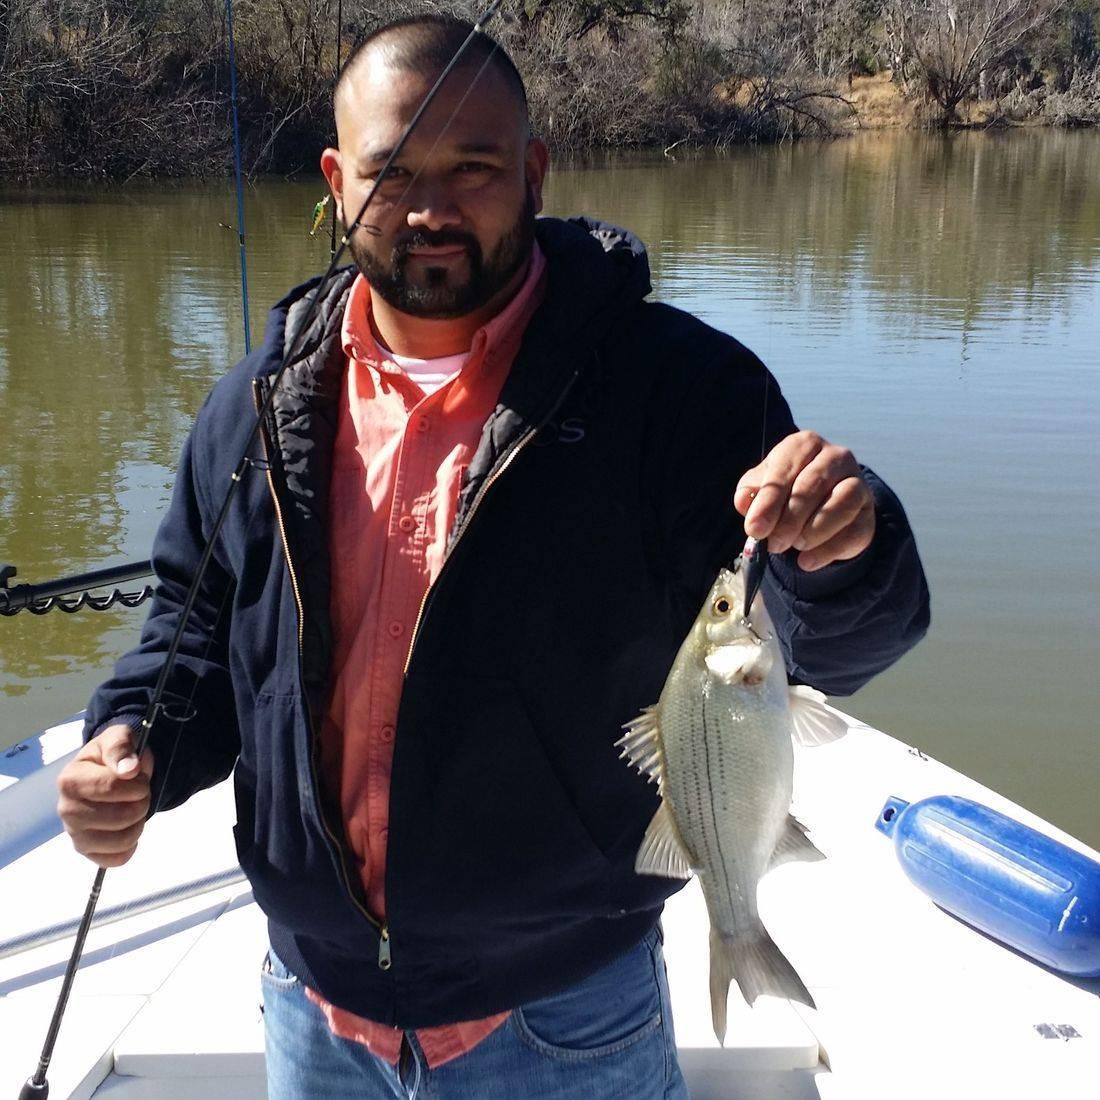 'Fishing Guides San Antonio' 'San Antonio Fishing' 'Fishing guide service' 'fishing charters and trips' 'Calaveras Lake Fishing Guides' 'Braunig Lake Fishing Guides' 'Canyon Lake Fishing Guides' 'Choke Canyon Reservoir fishing guides' 'guided fishing tours' 'Alamo and River walk tourism'